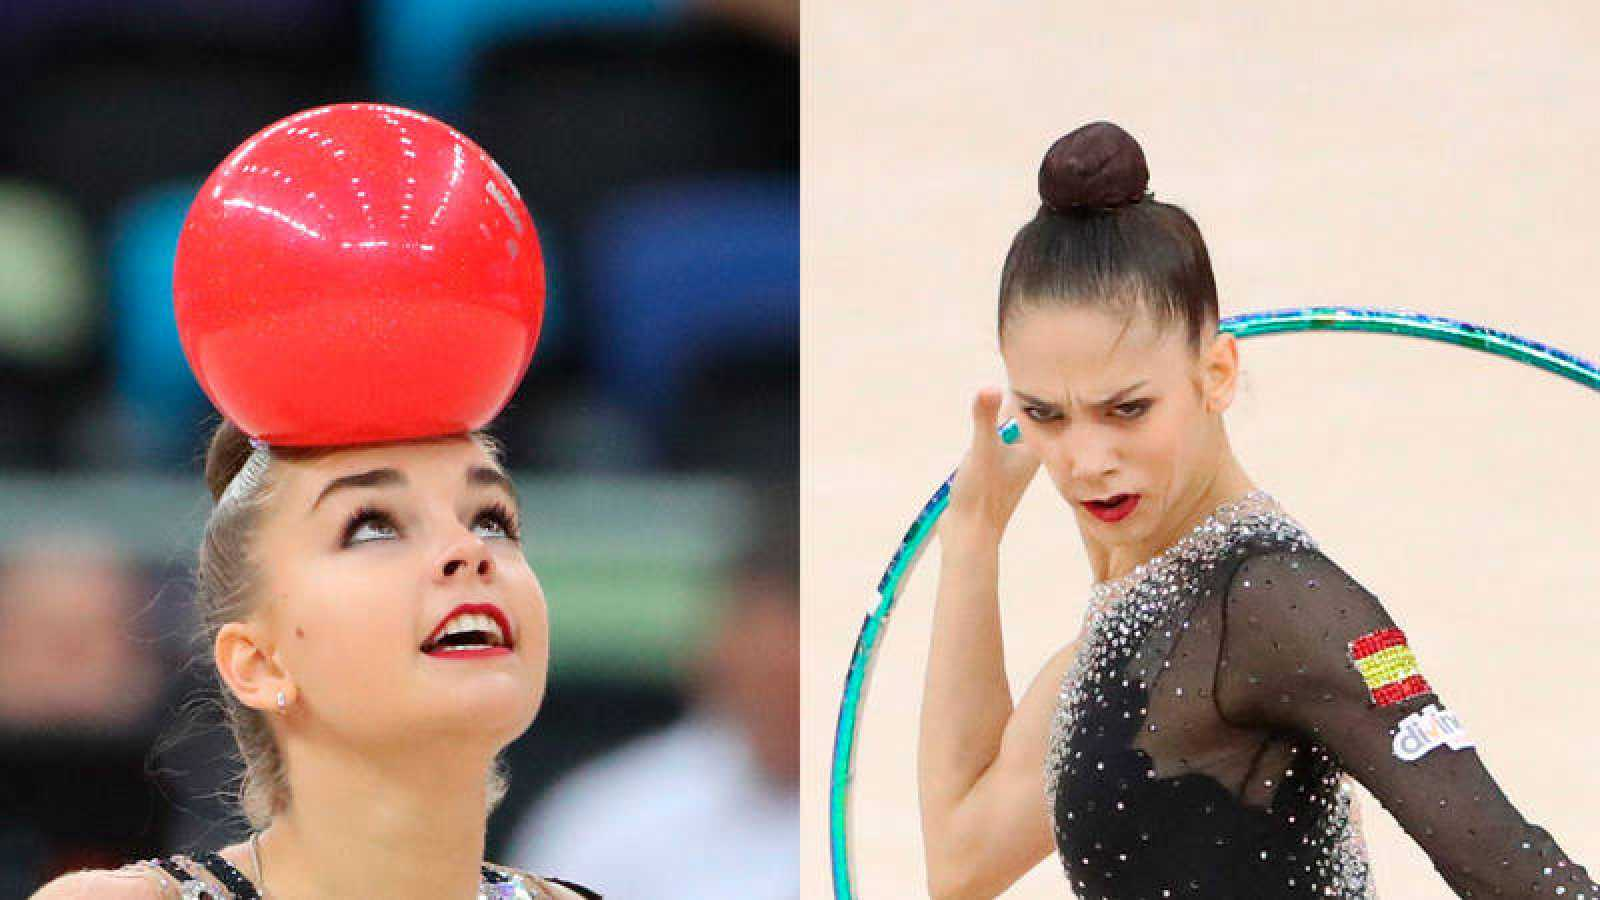 Dina Averina (izqda) y Polina Berezina, este viernes en Bakú